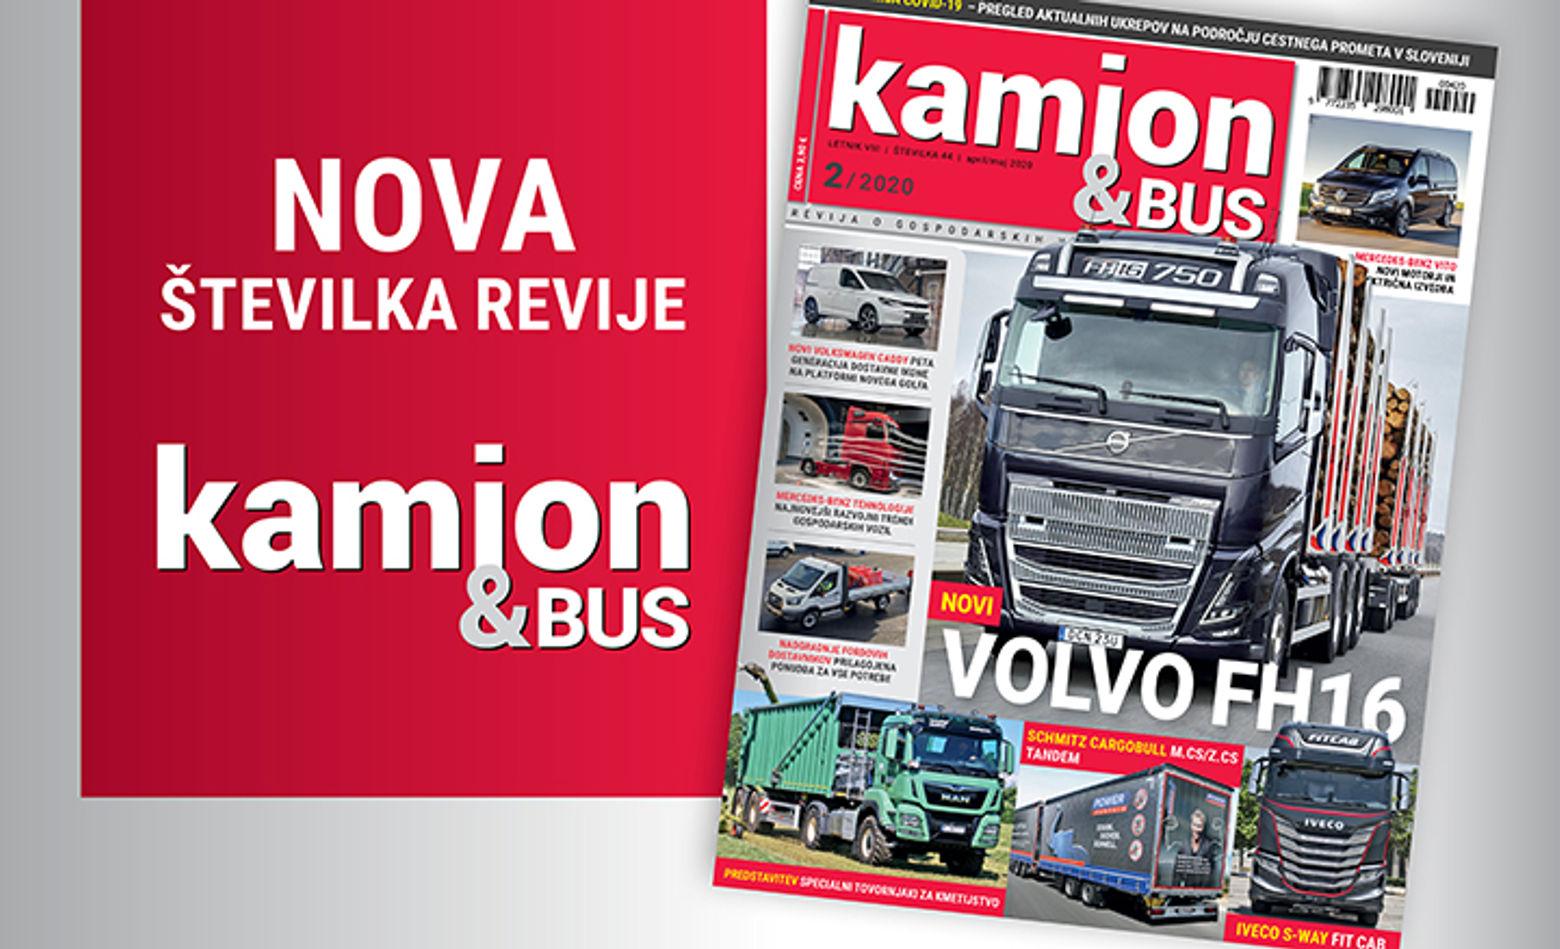 Nova številka revije Kamion&Bus